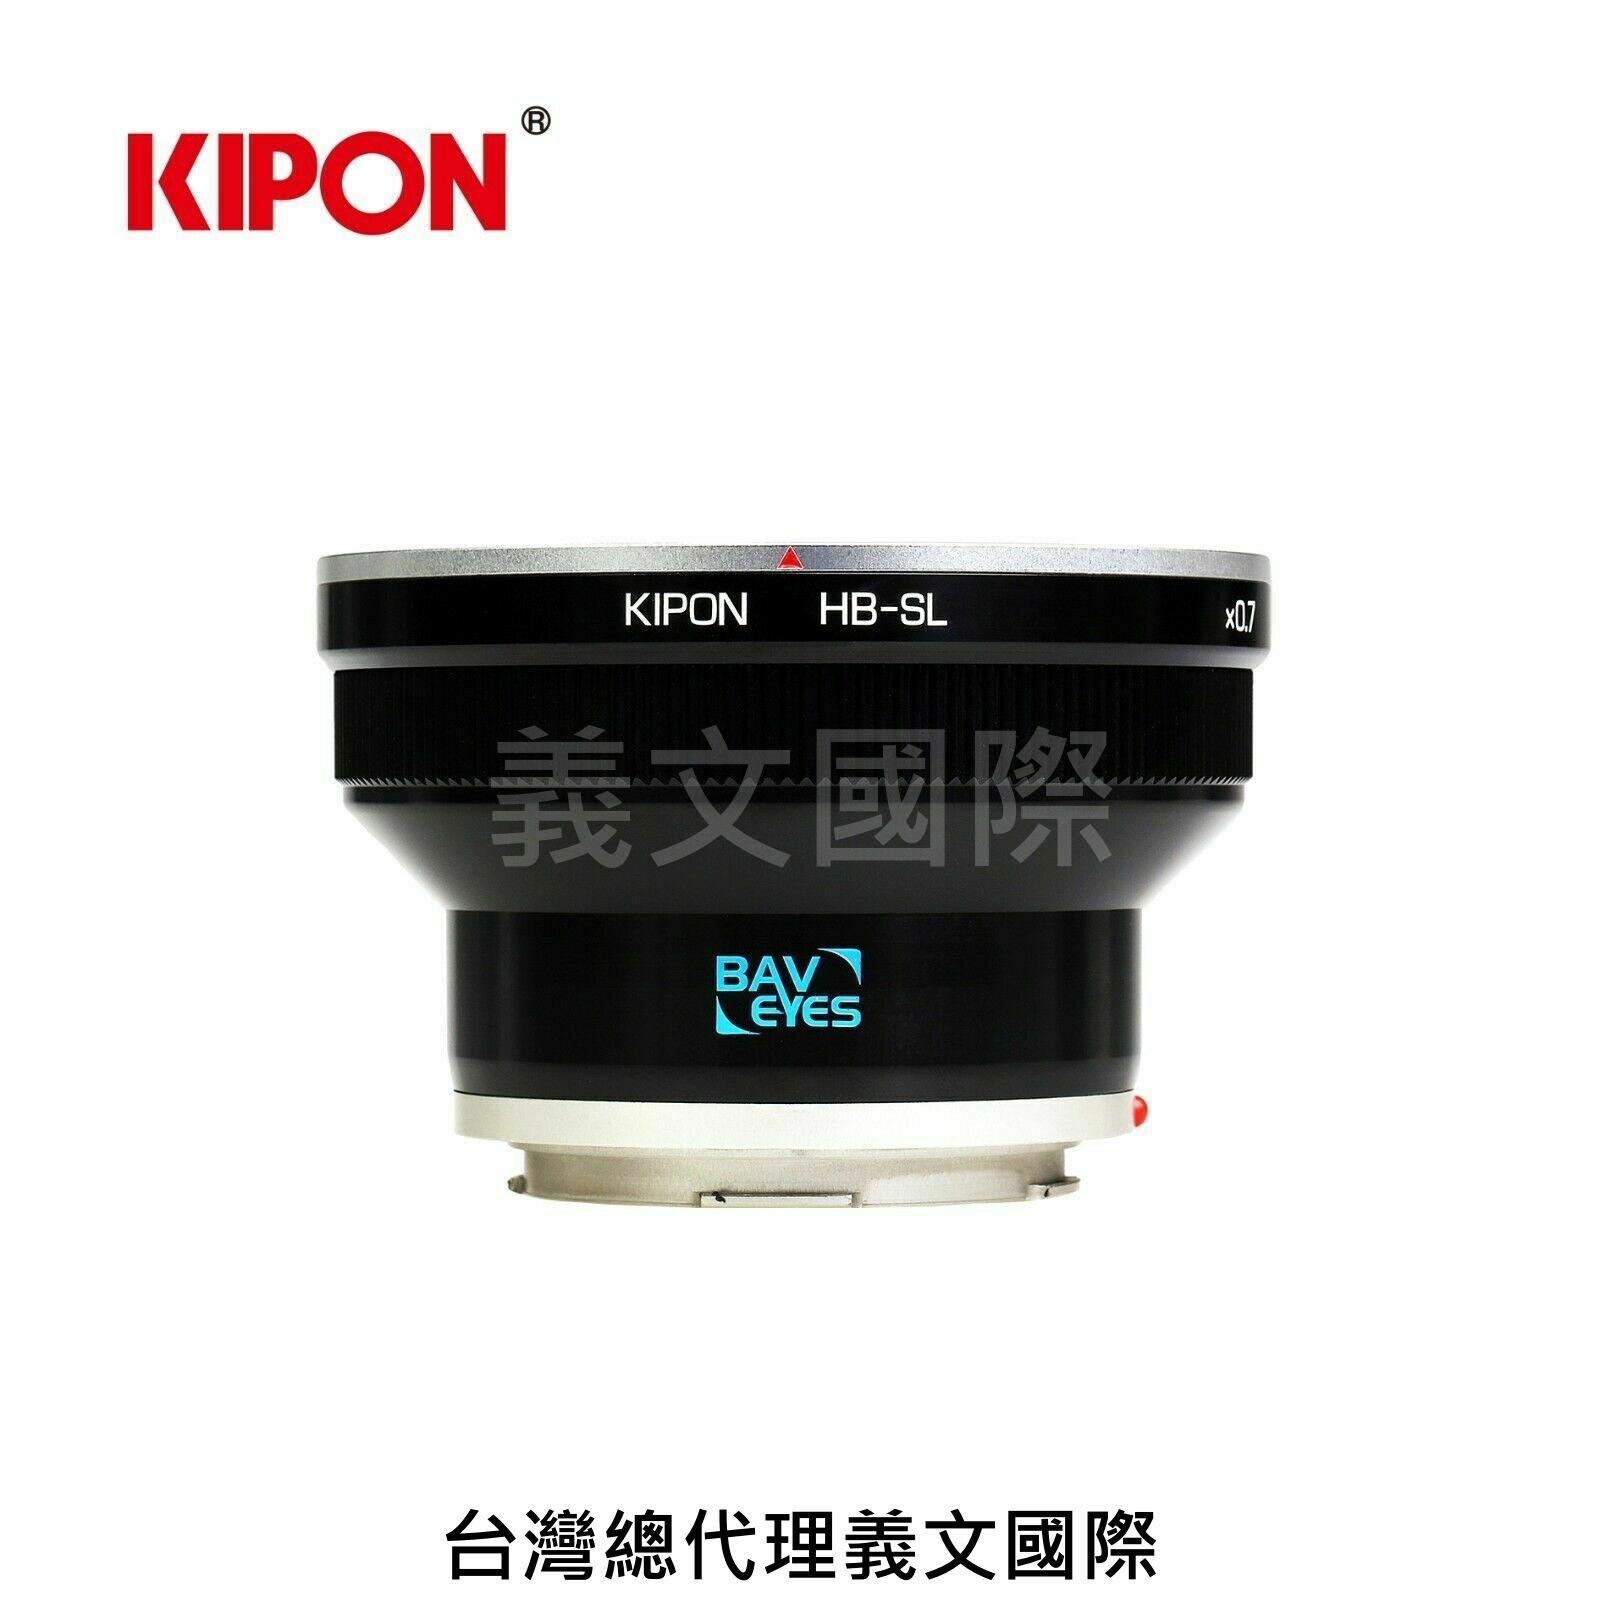 Kipon轉接環專賣店:Baveyes HB-L 0.7x(Leica SL,徠卡,哈蘇,Hasselblad,減焦,0.7倍,S1,S1R,S1H,TL,TL2,SIGMA FP)